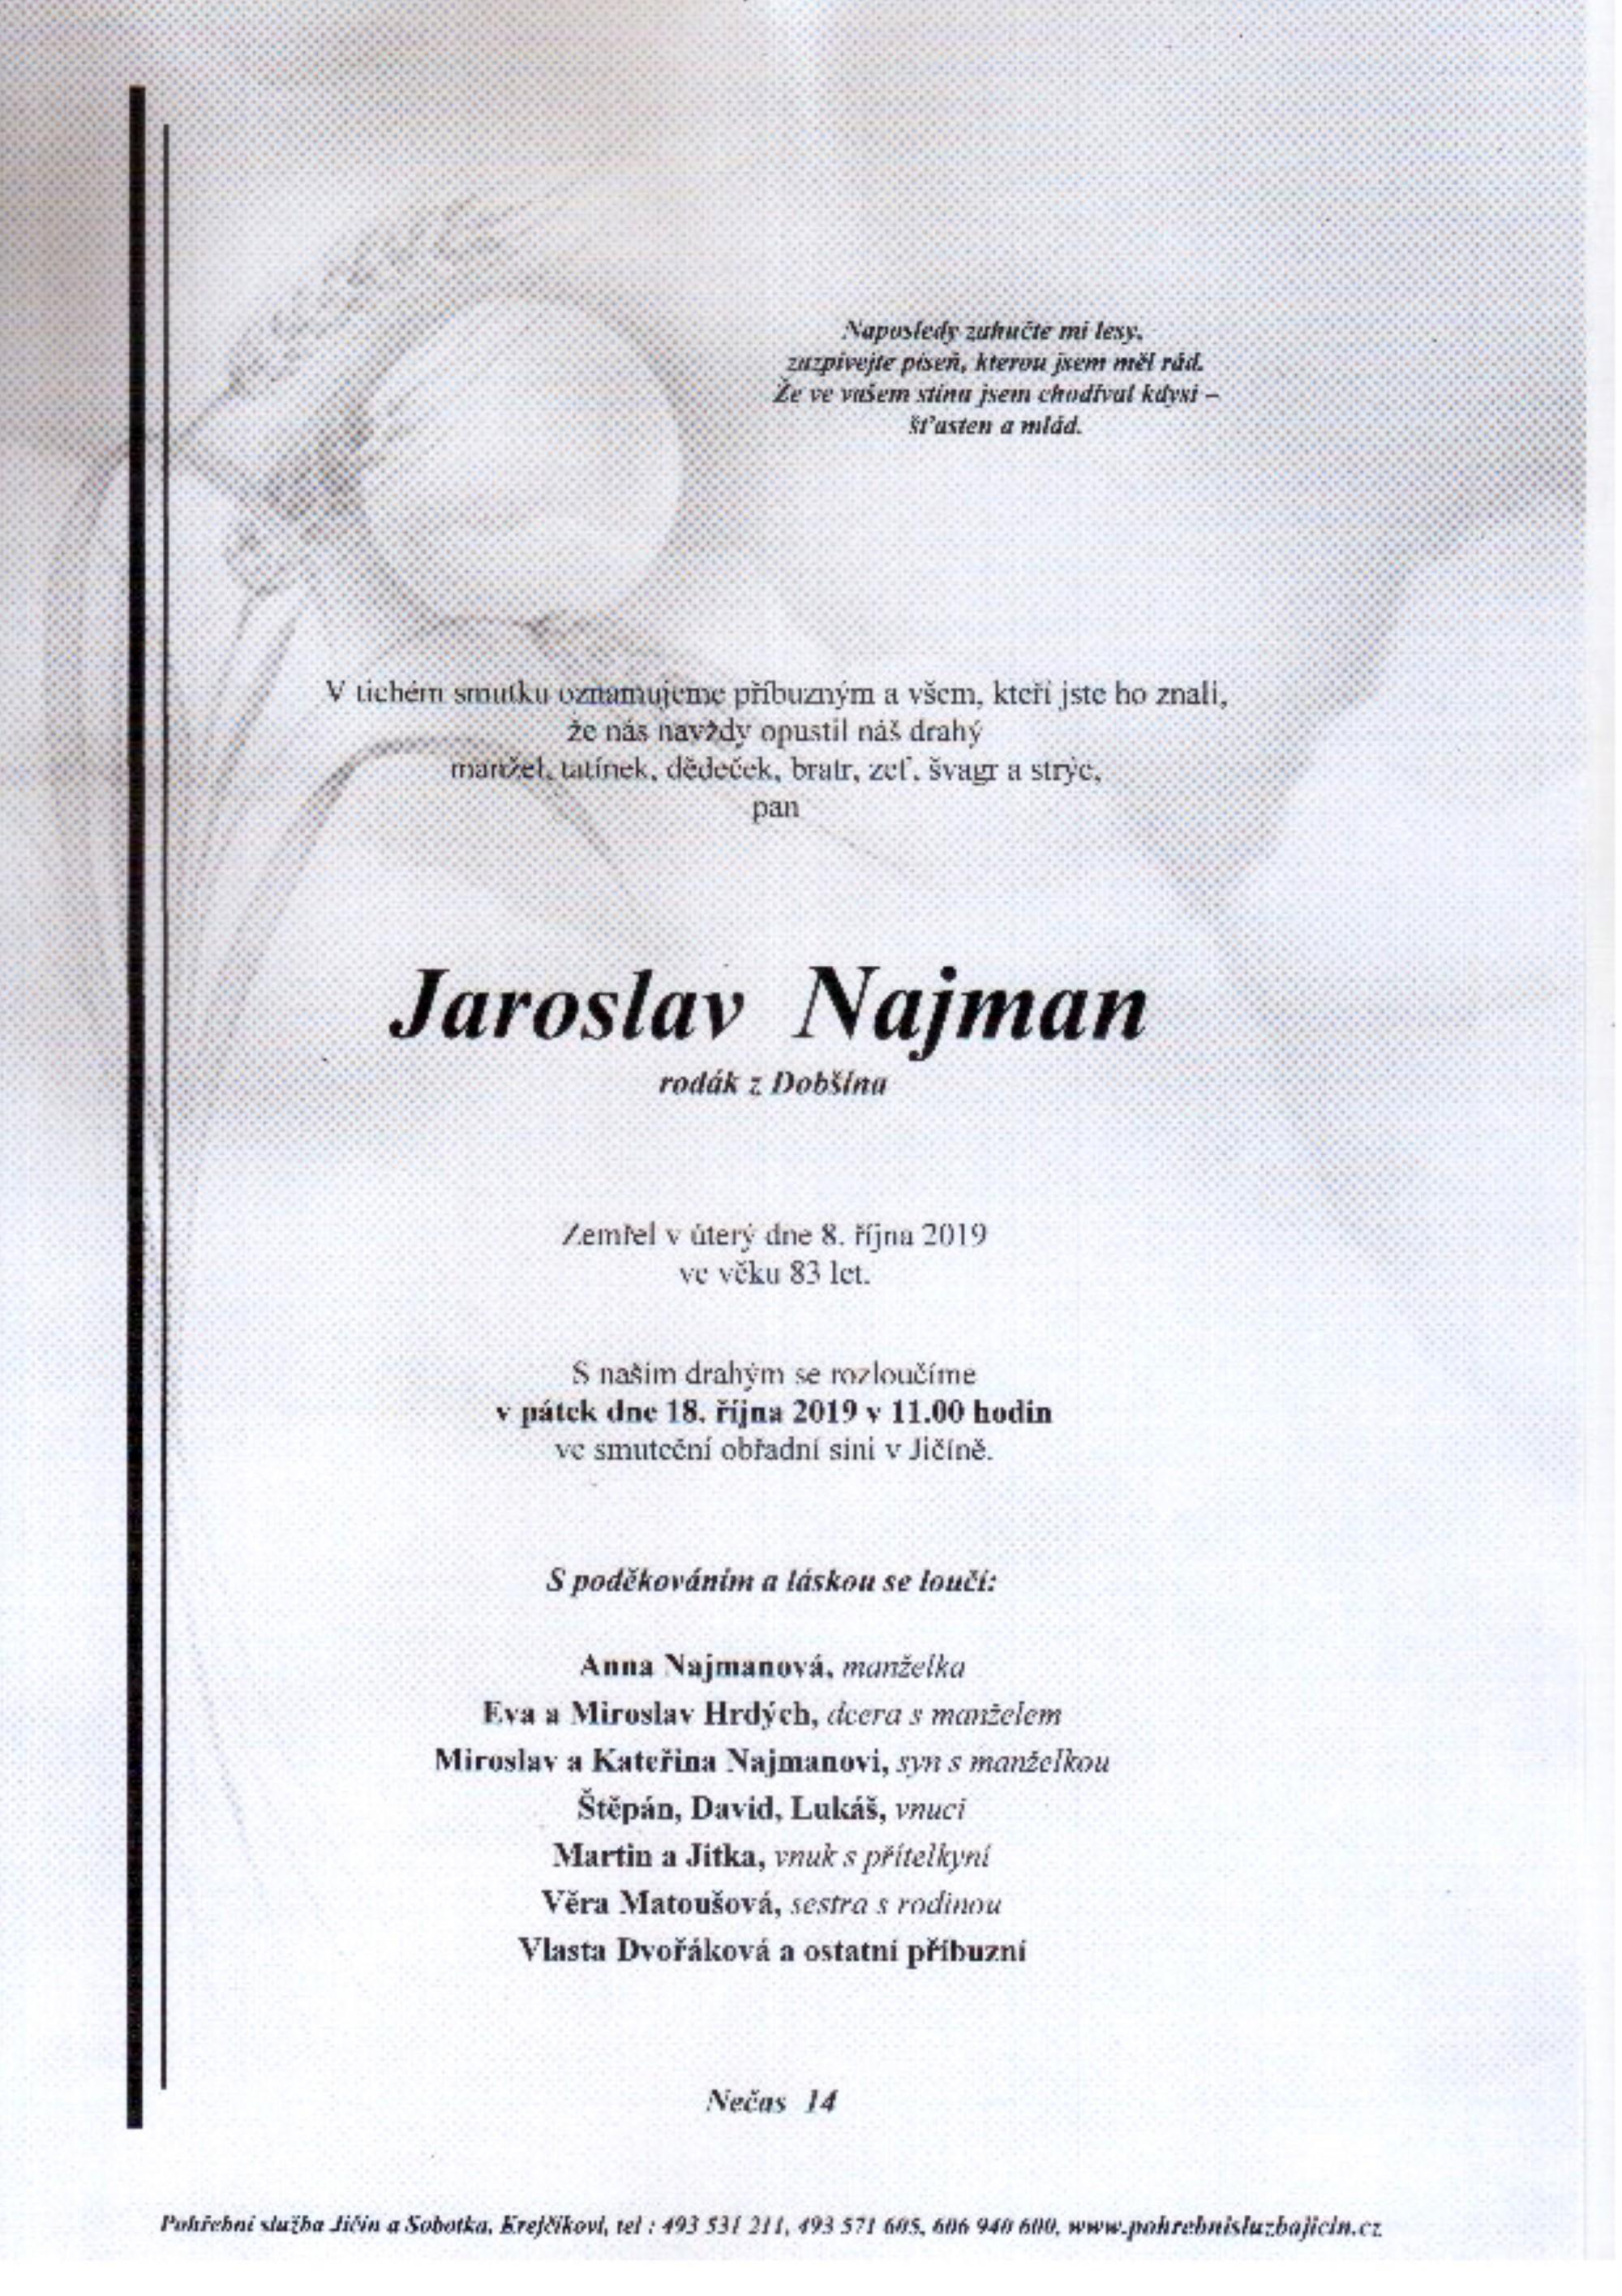 Jaroslav Najman